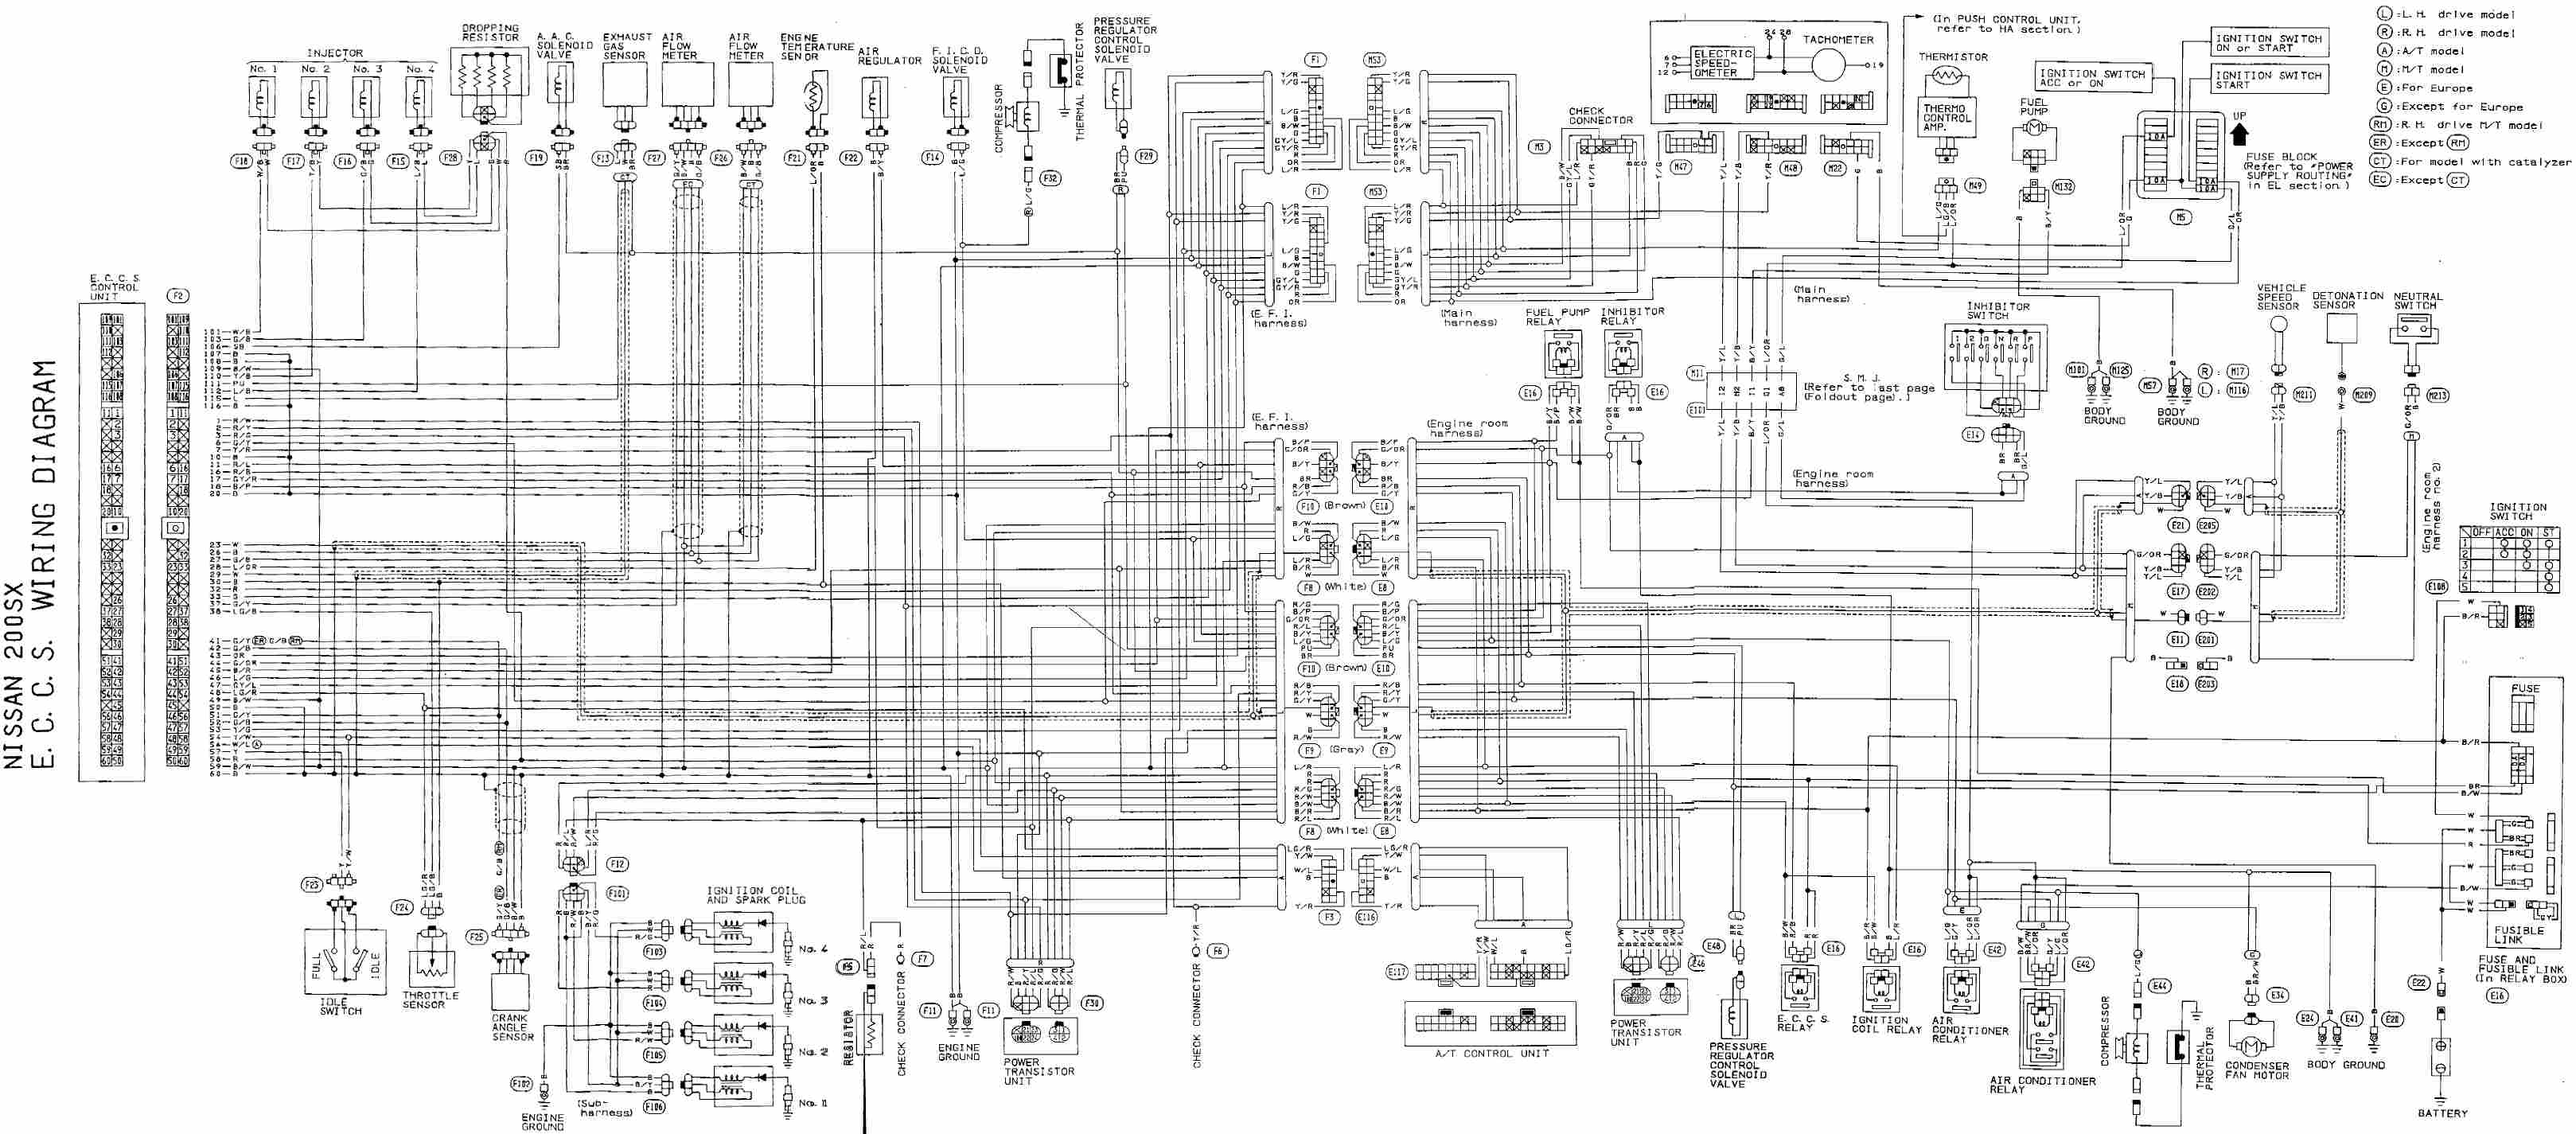 2004 saab 9 3 headlight wiring diagram  saab  auto wiring